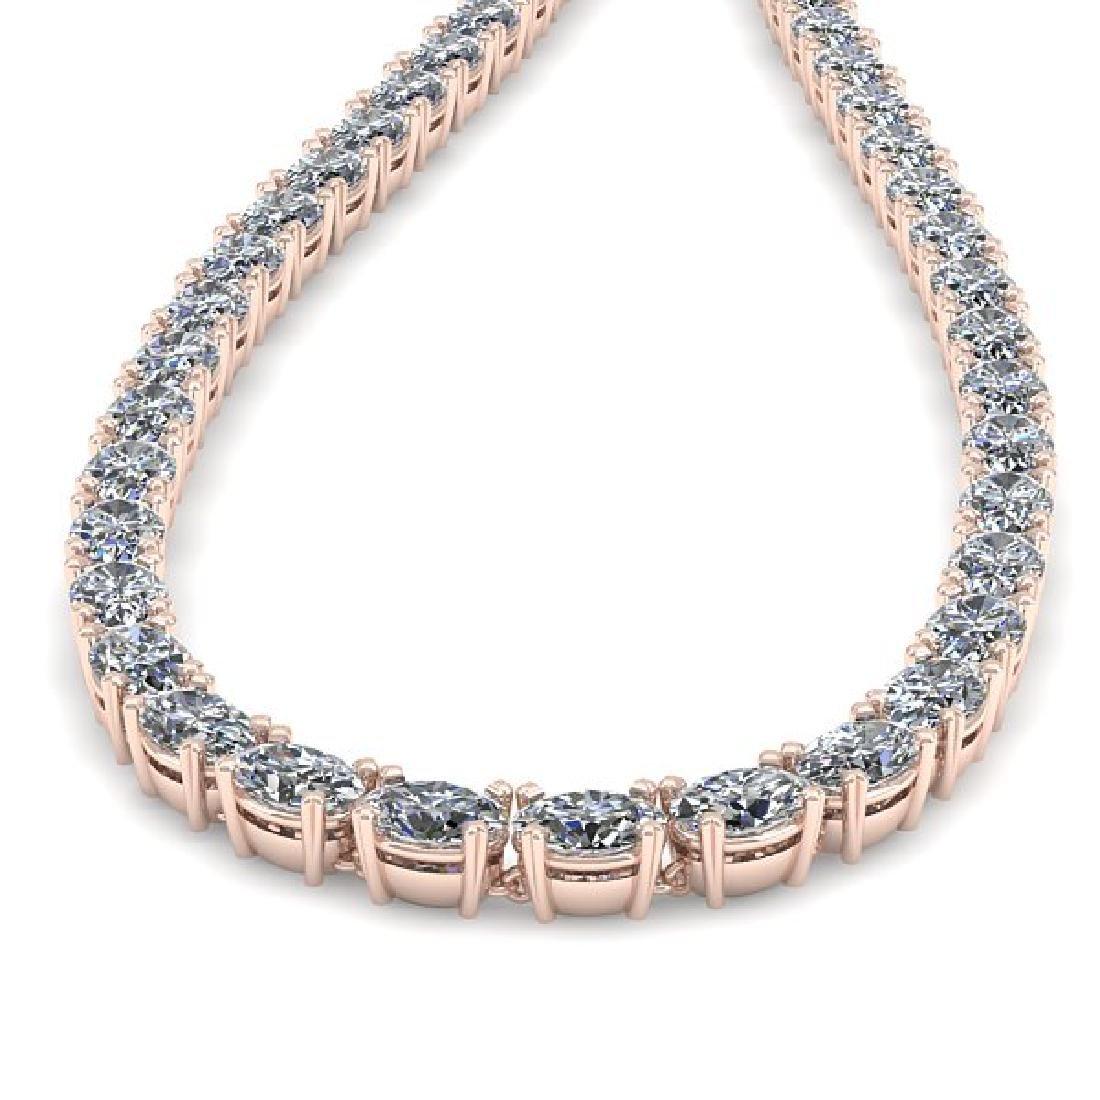 26 CTW Oval Cut Certified SI Diamond Necklace 14K Rose